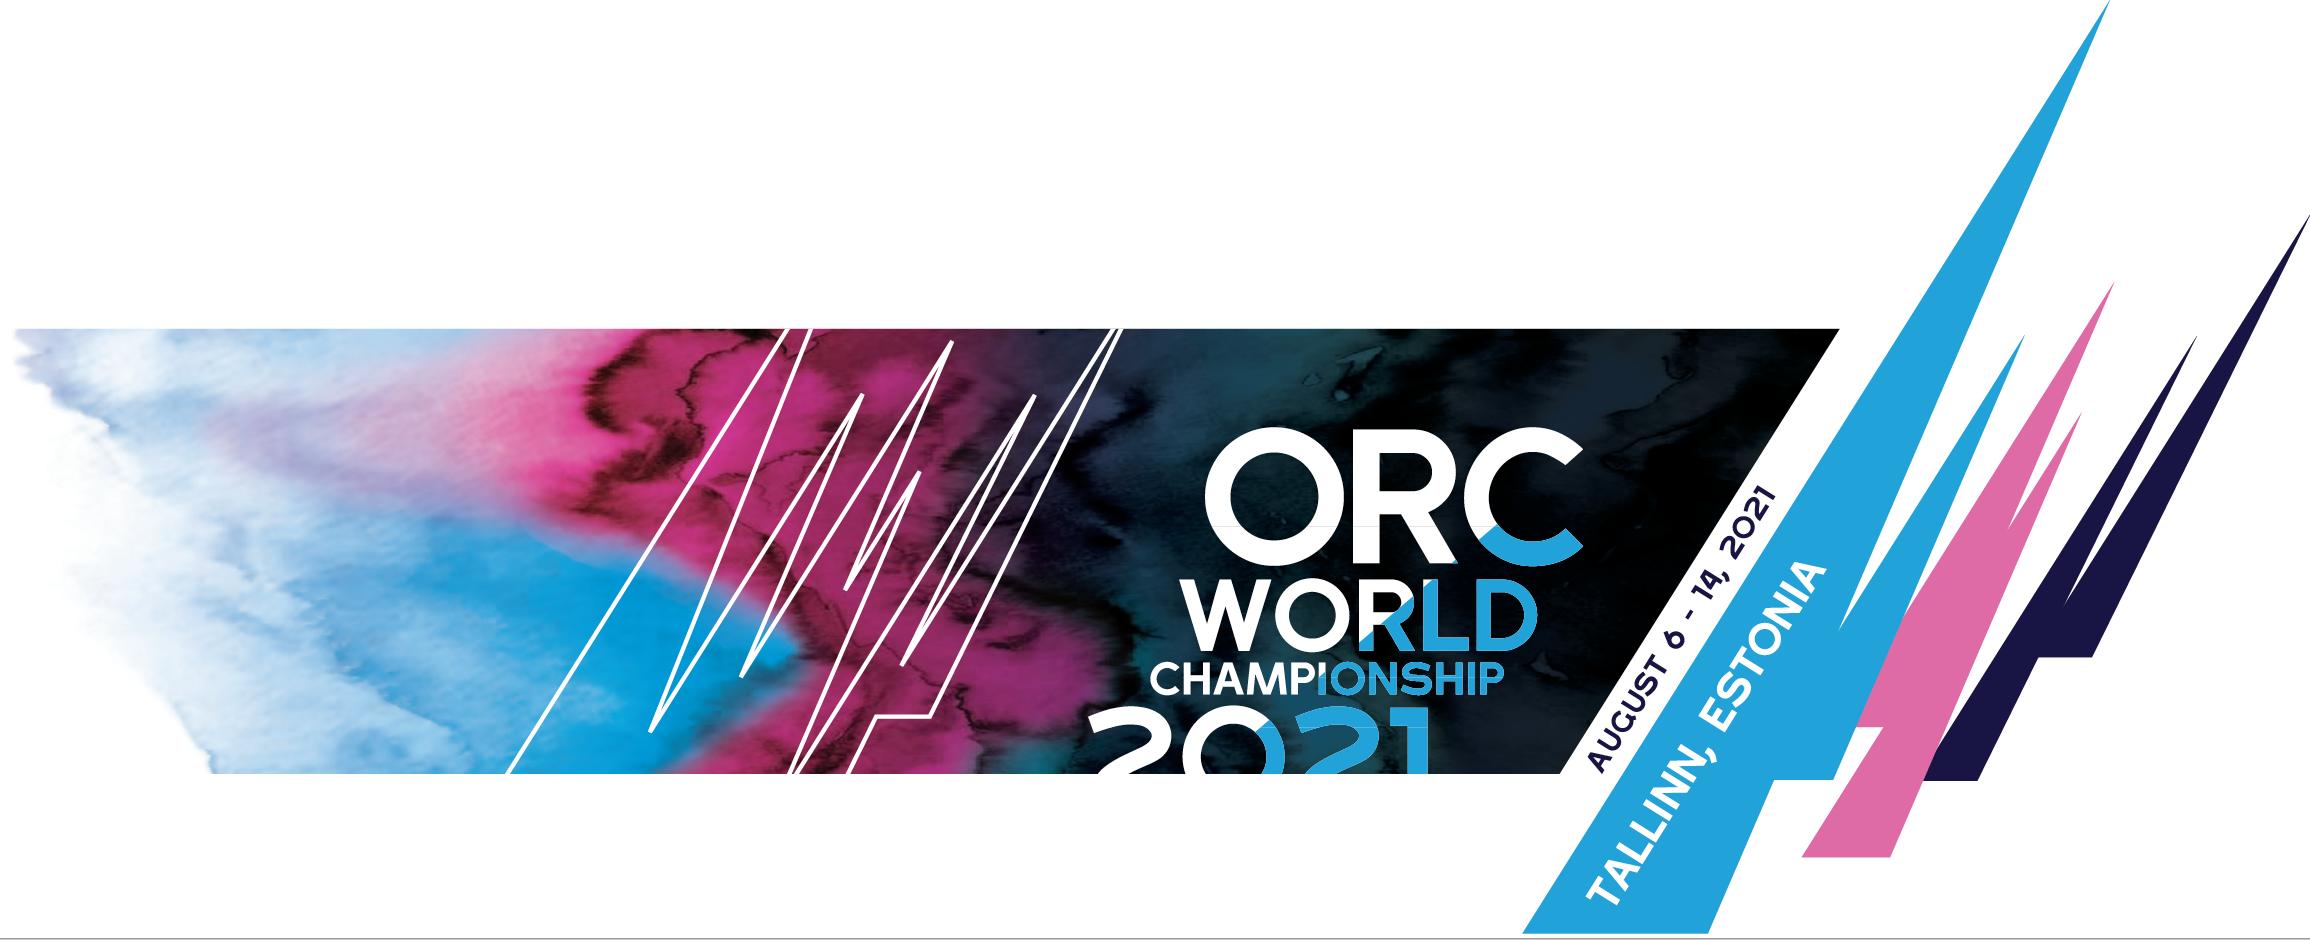 ORC Worlds 2021 Tallinna Estonia logo